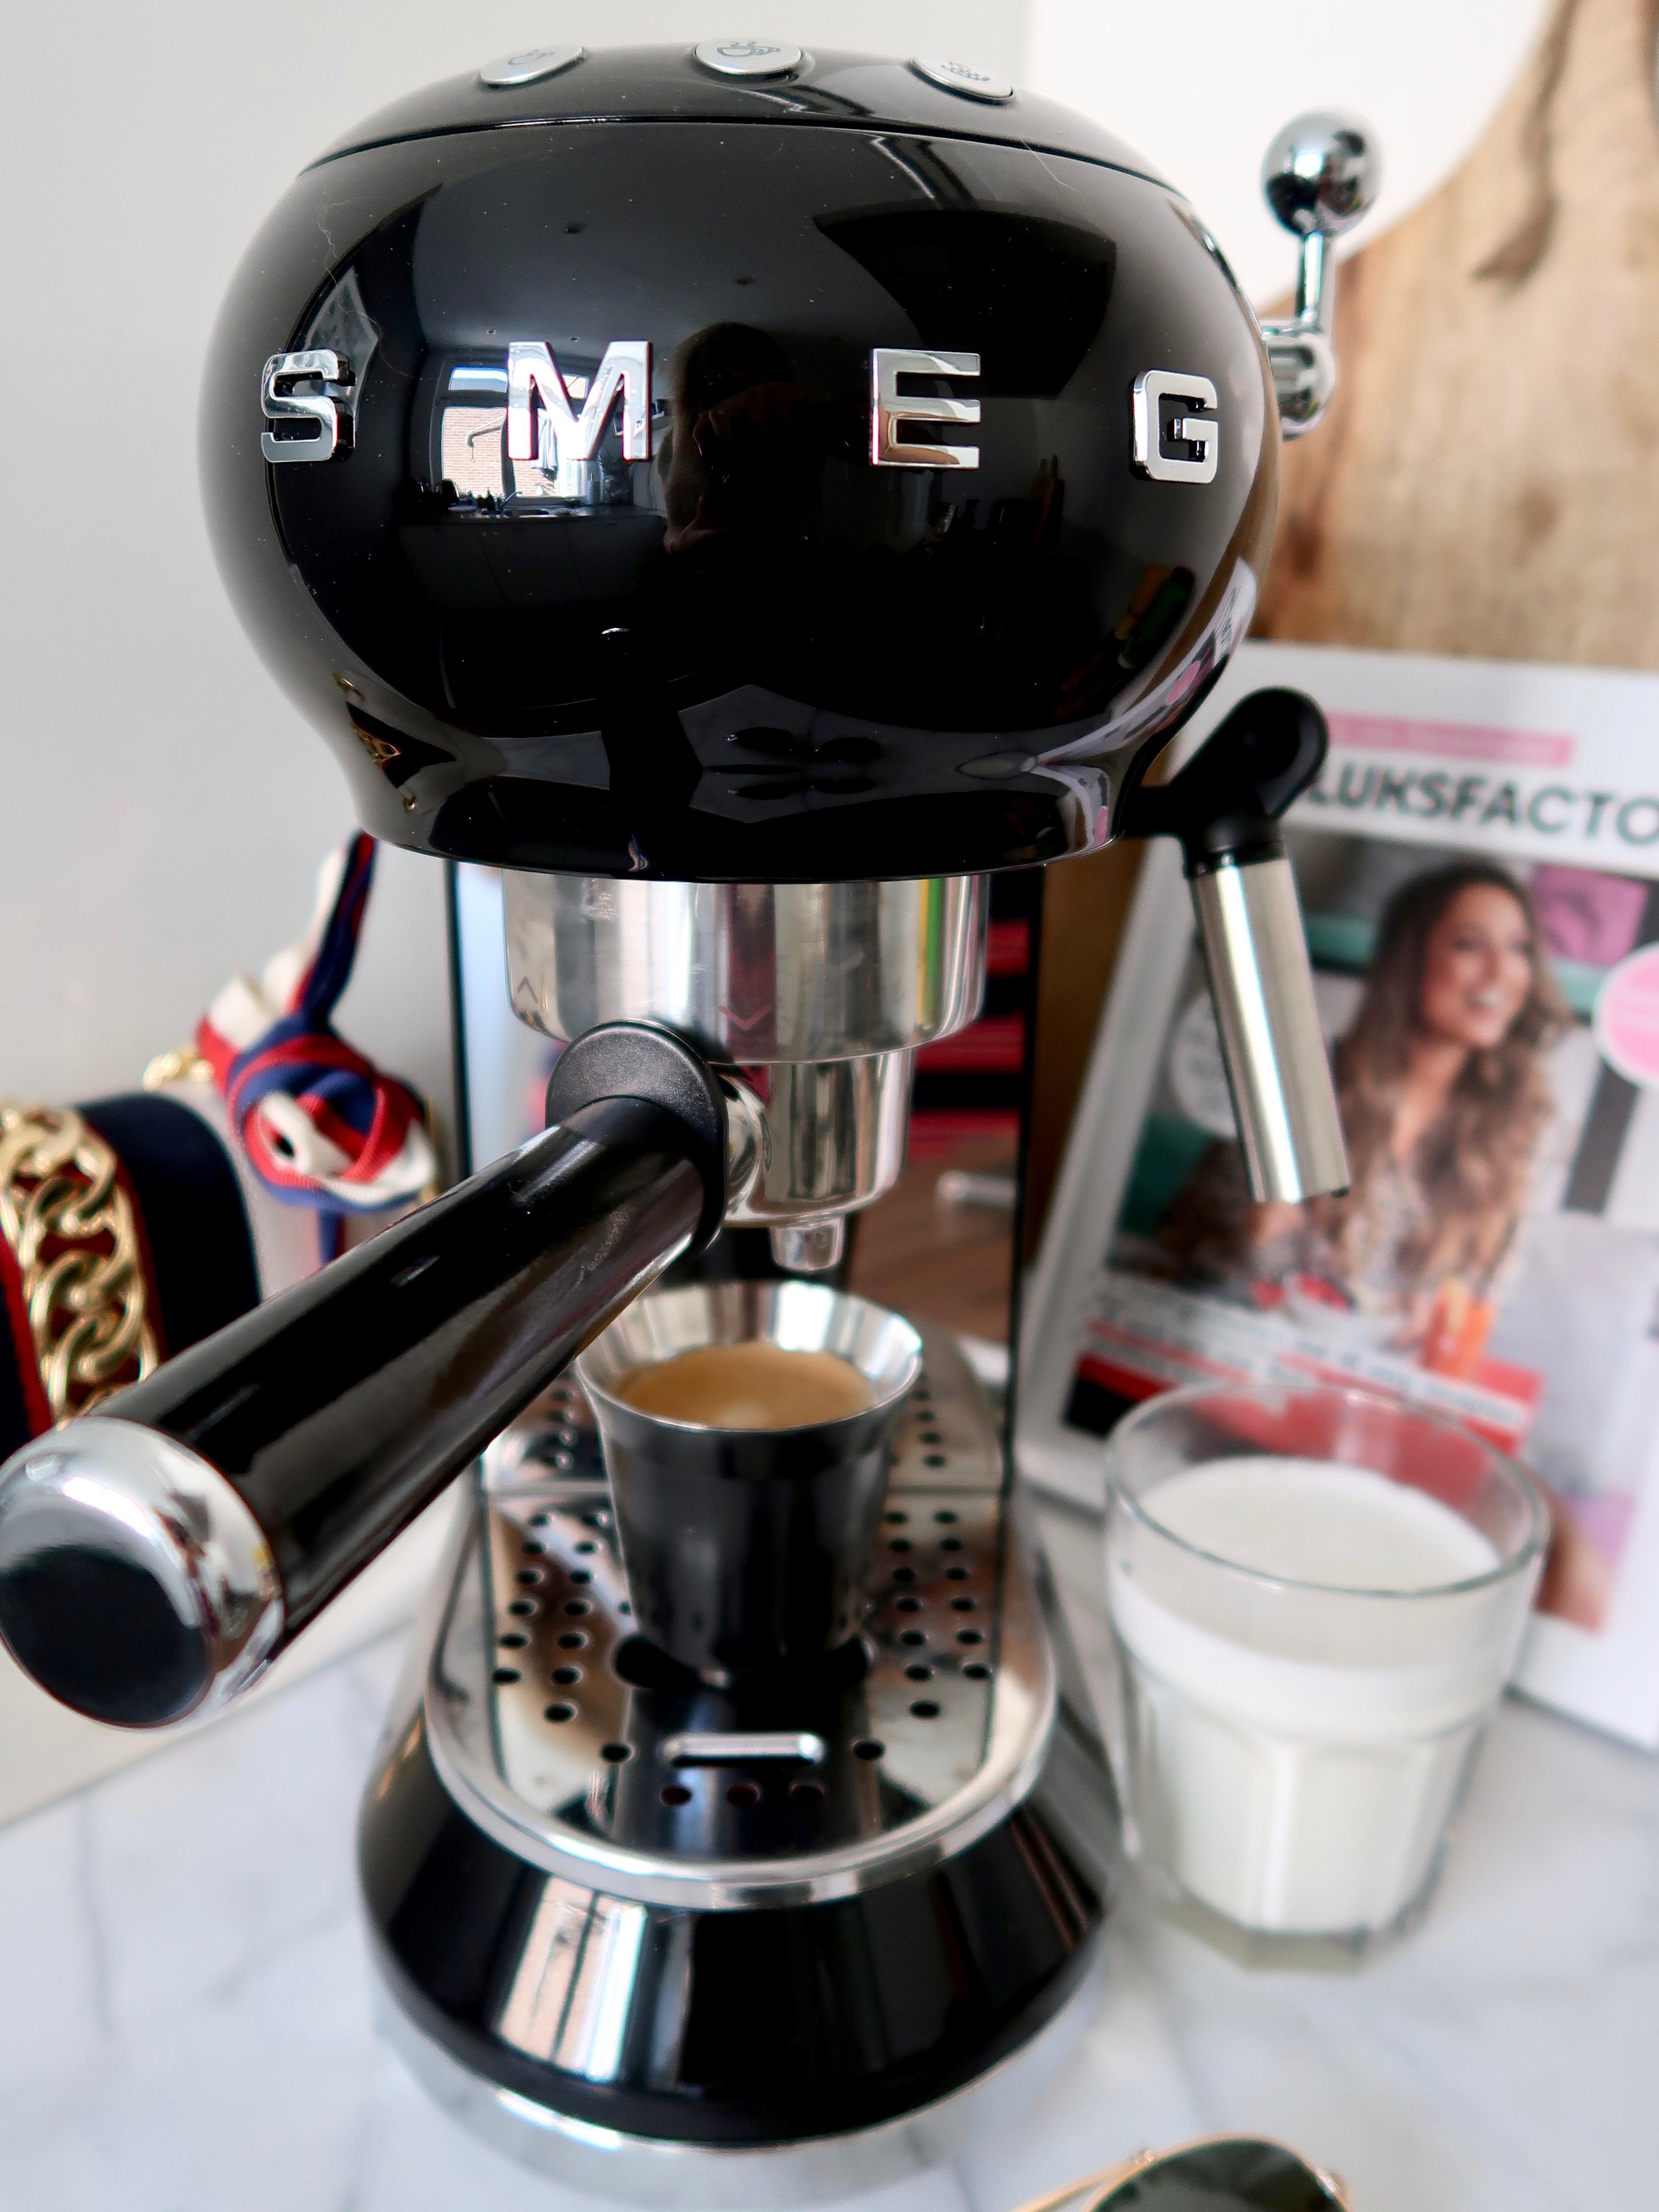 Smeg Coffee Machine Review